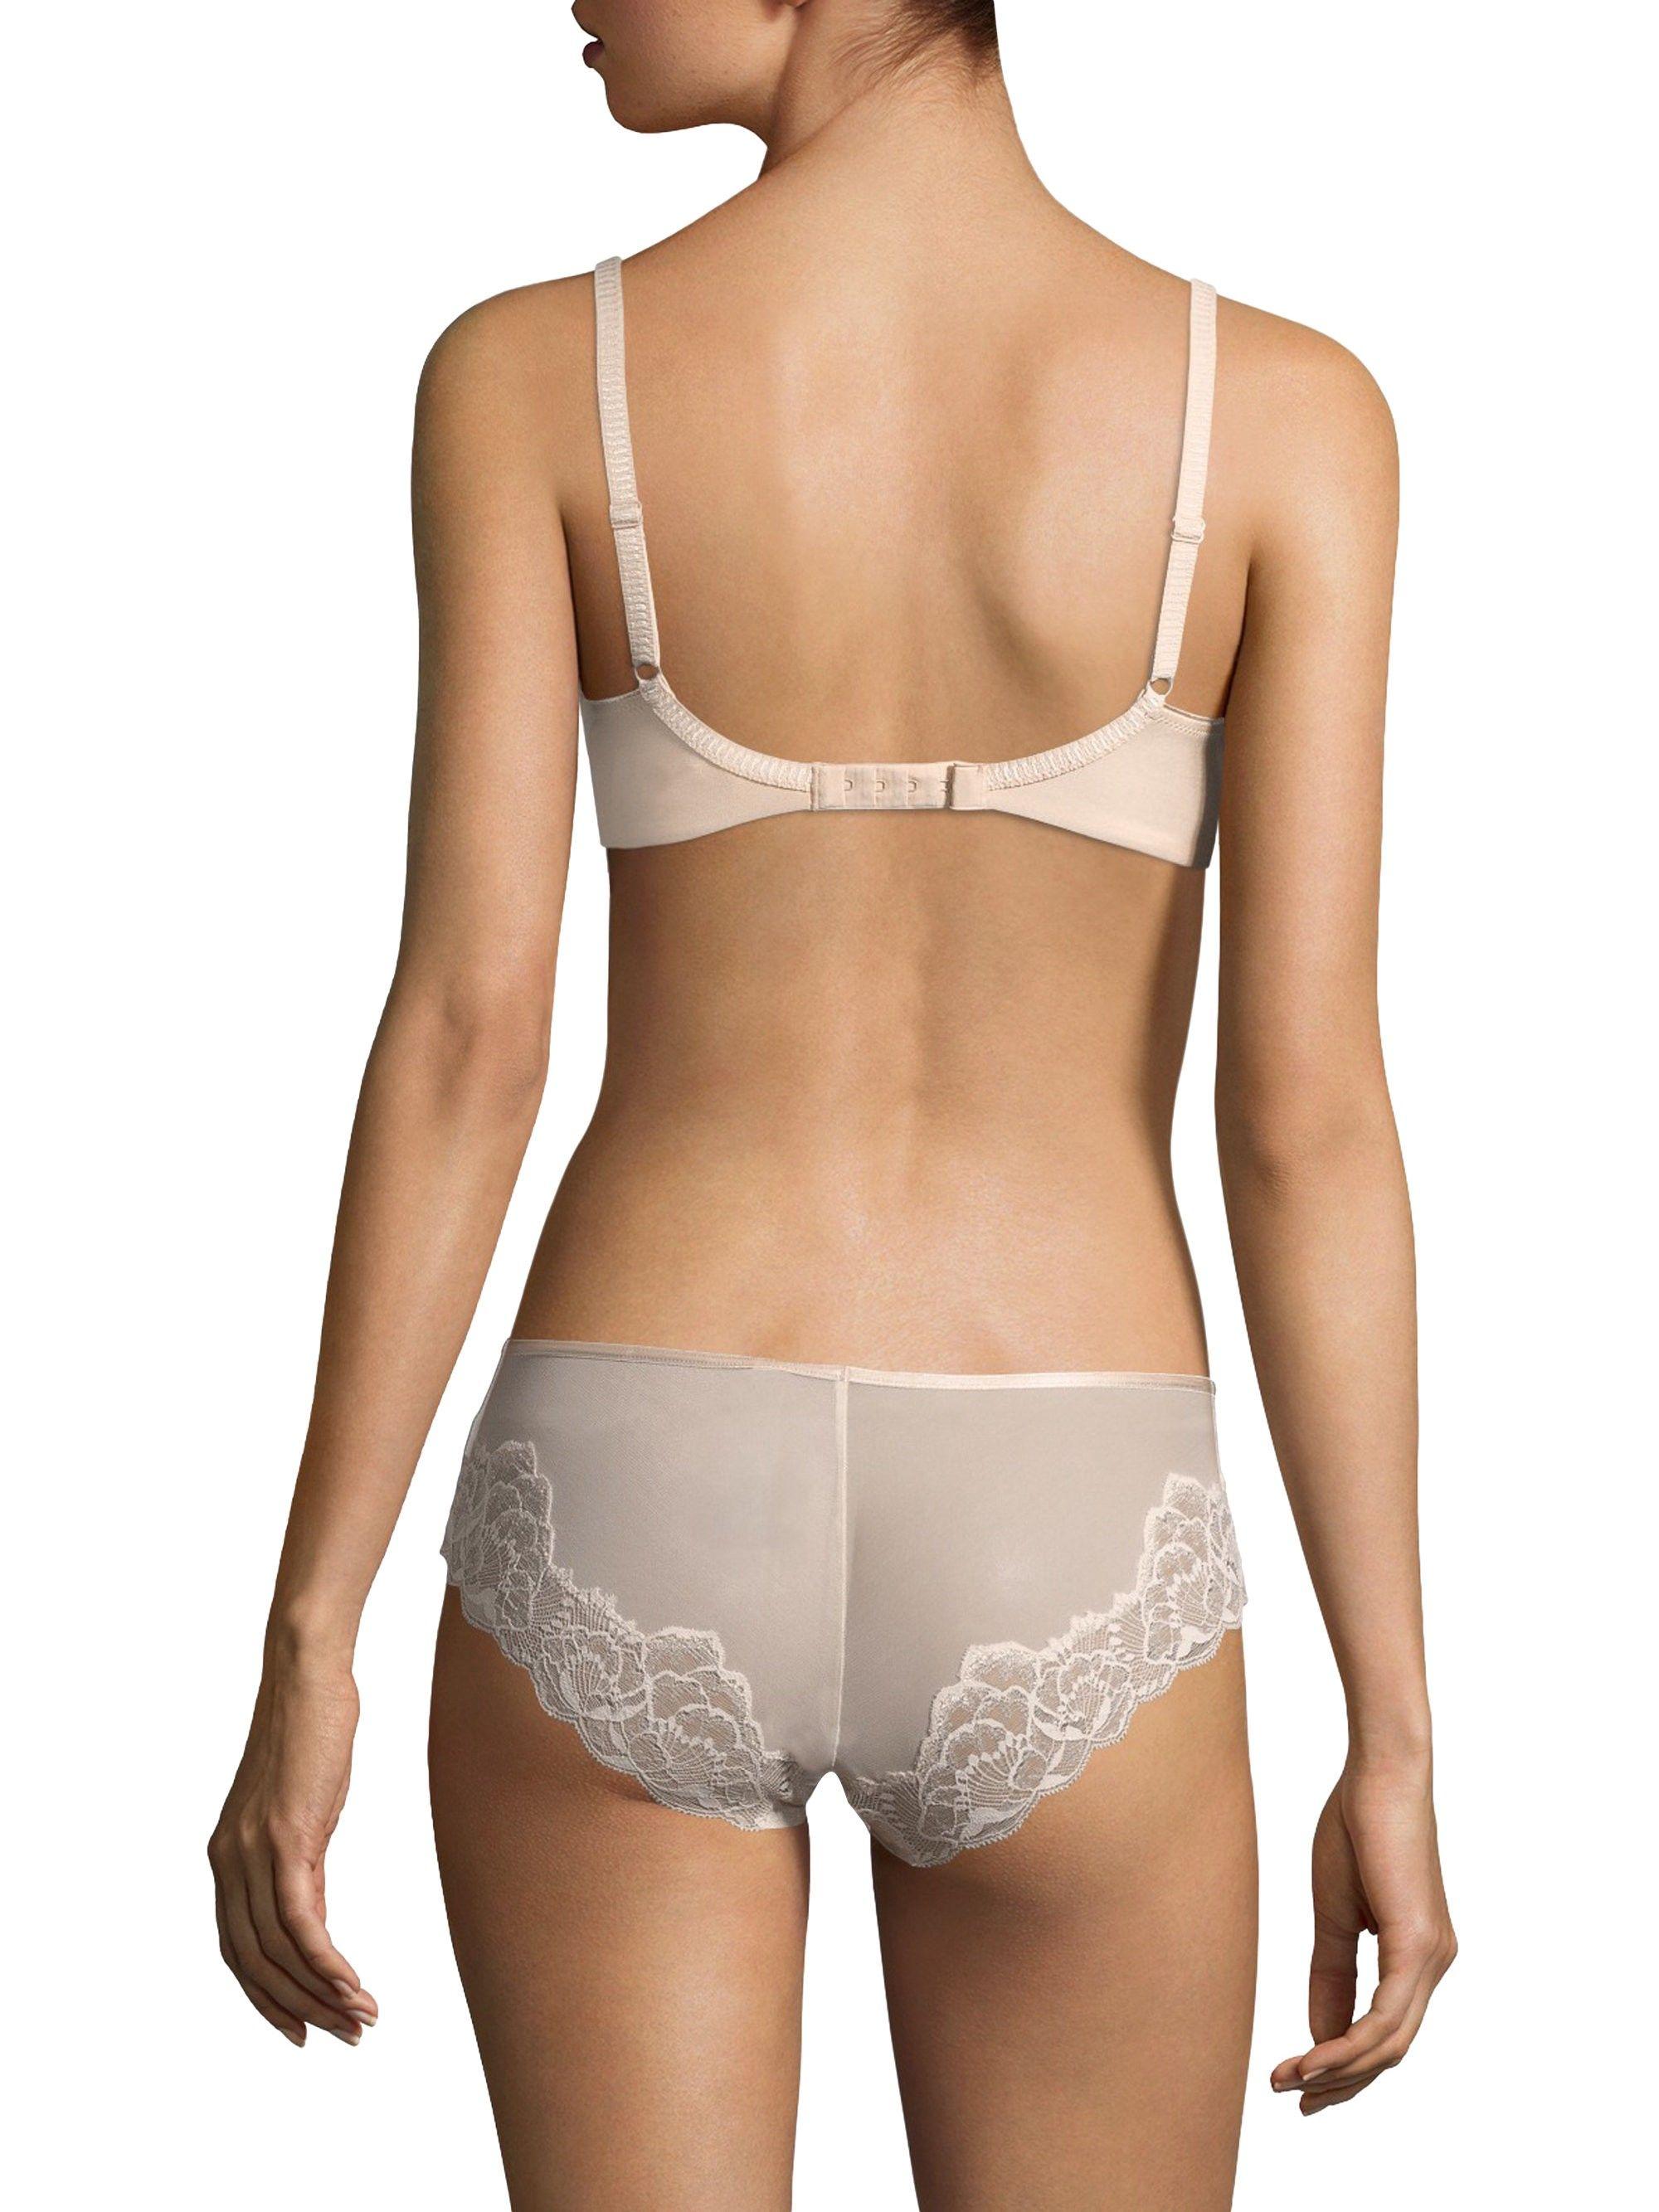 fc2924703184b Chantelle Orangerie Lace Plunge Bra - Misty Grey Multi 30 E